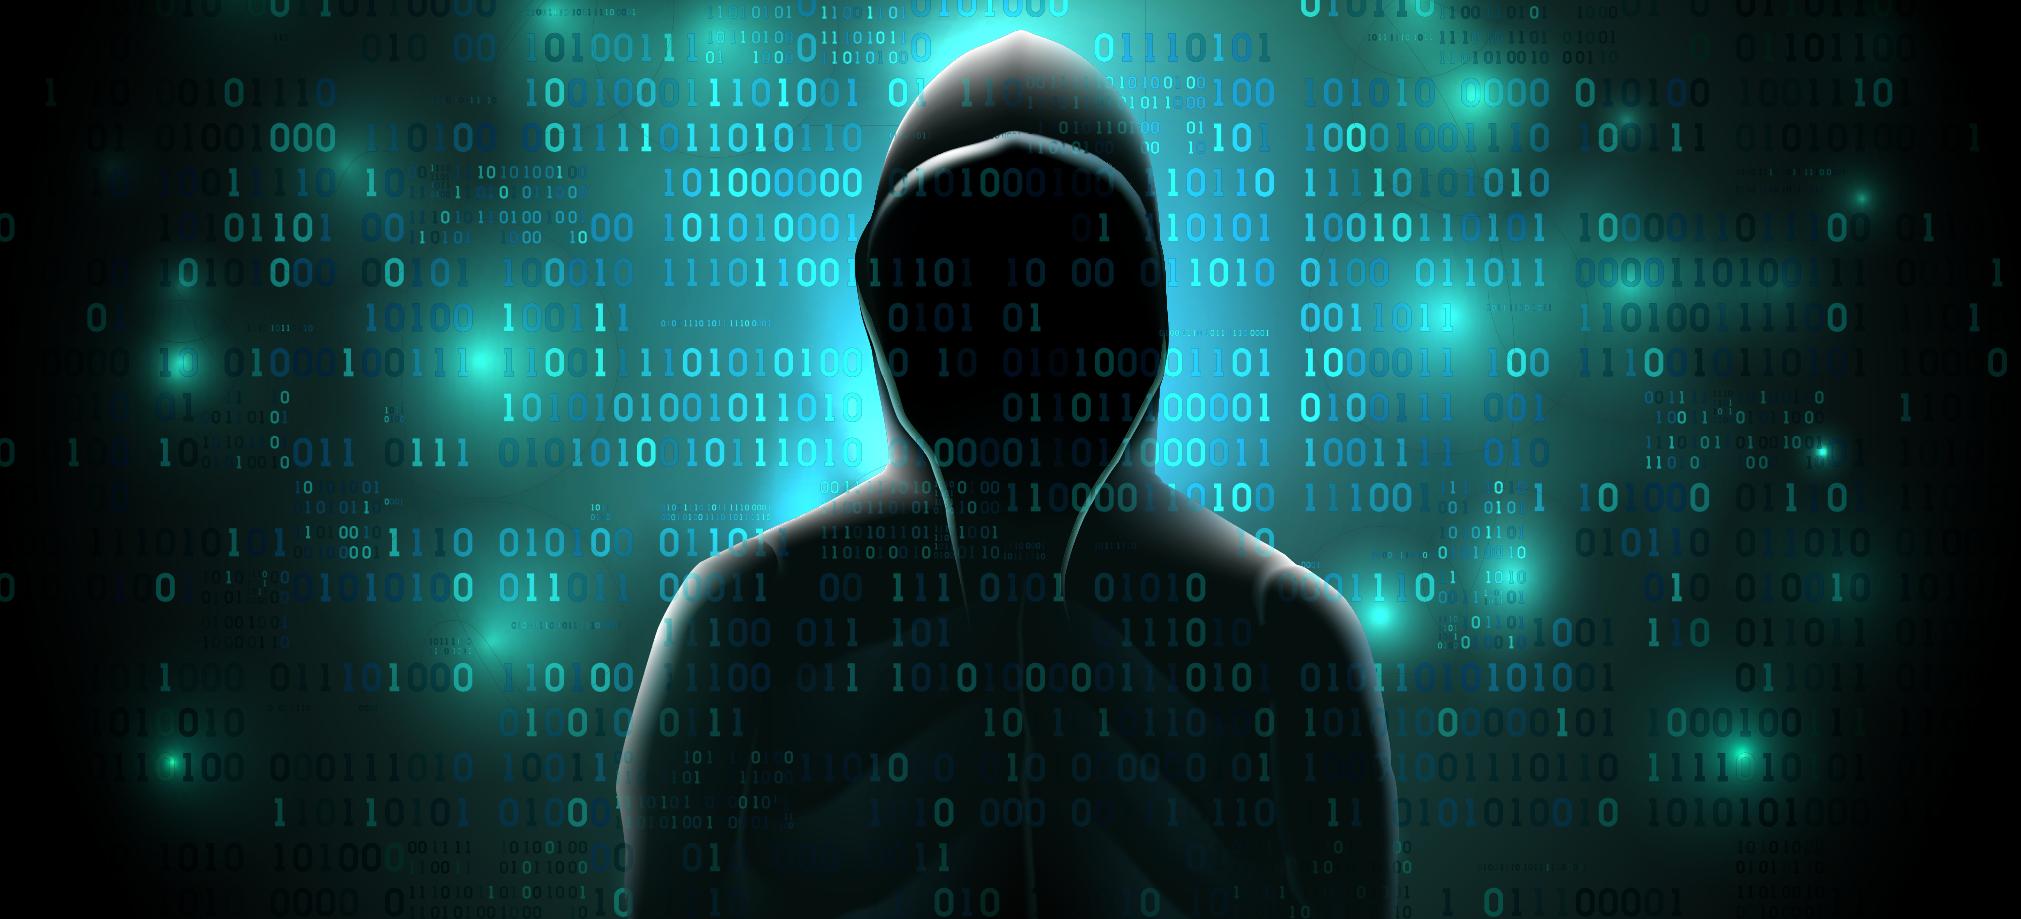 https: img-o.okeinfo.net content 2019 05 19 92 2057607 4-tips-agar-smartphone-anda-aman-dari-serangan-hacker-mHYdDkJVot.png